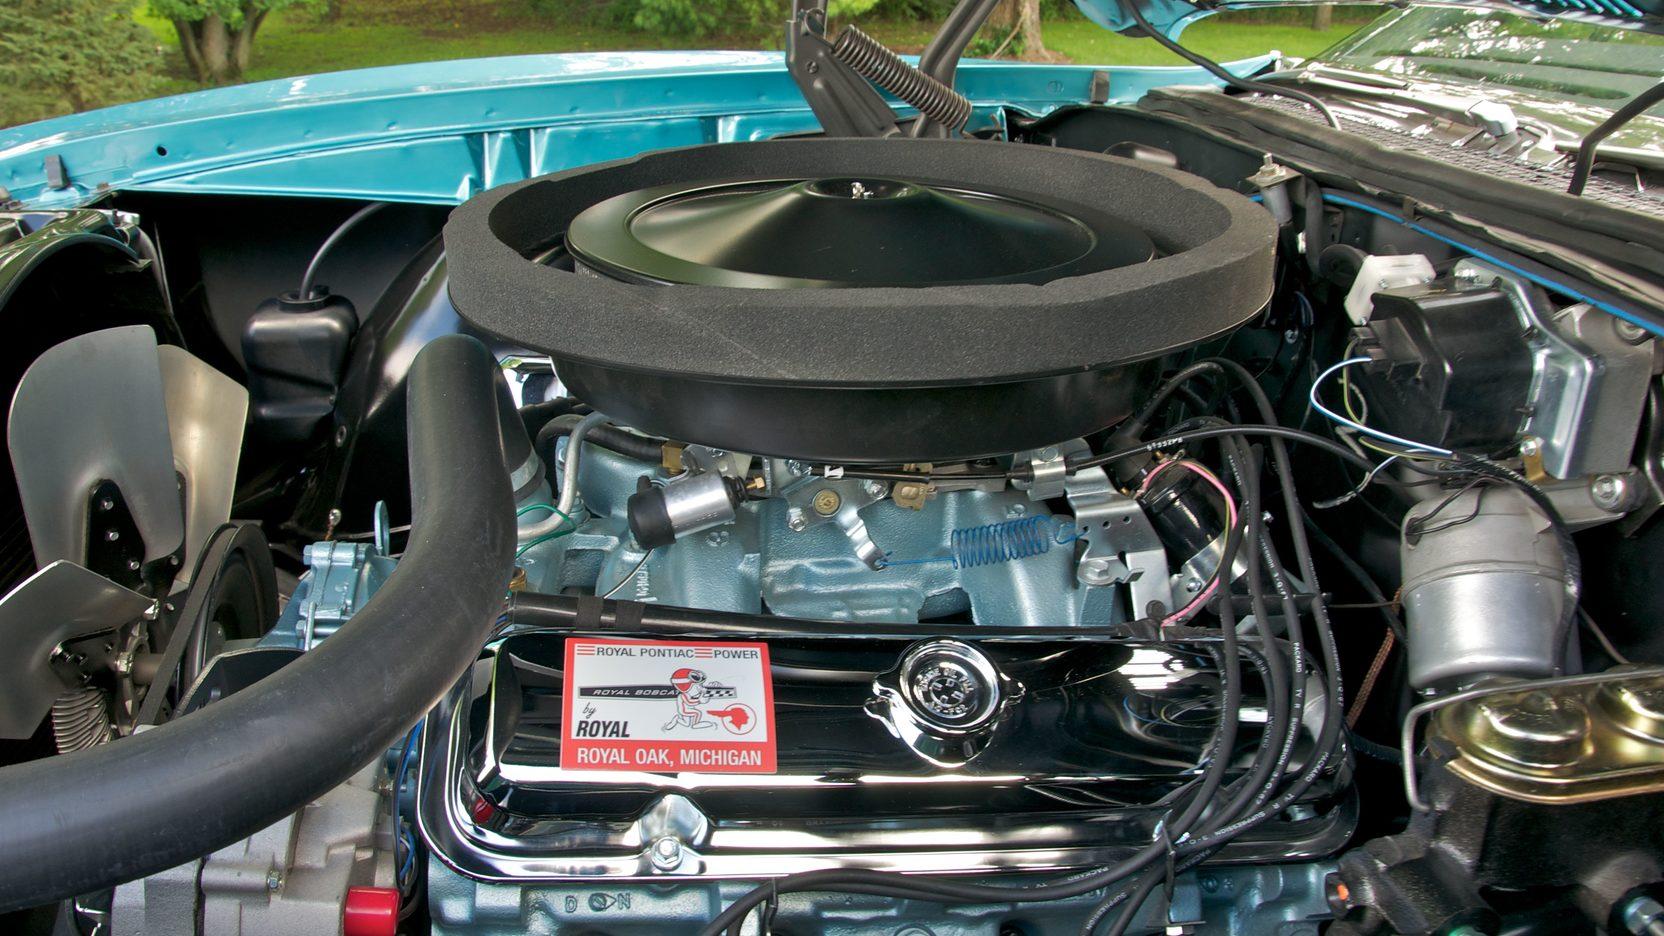 Royal Pontiac 428-engine on a 1968 GTO